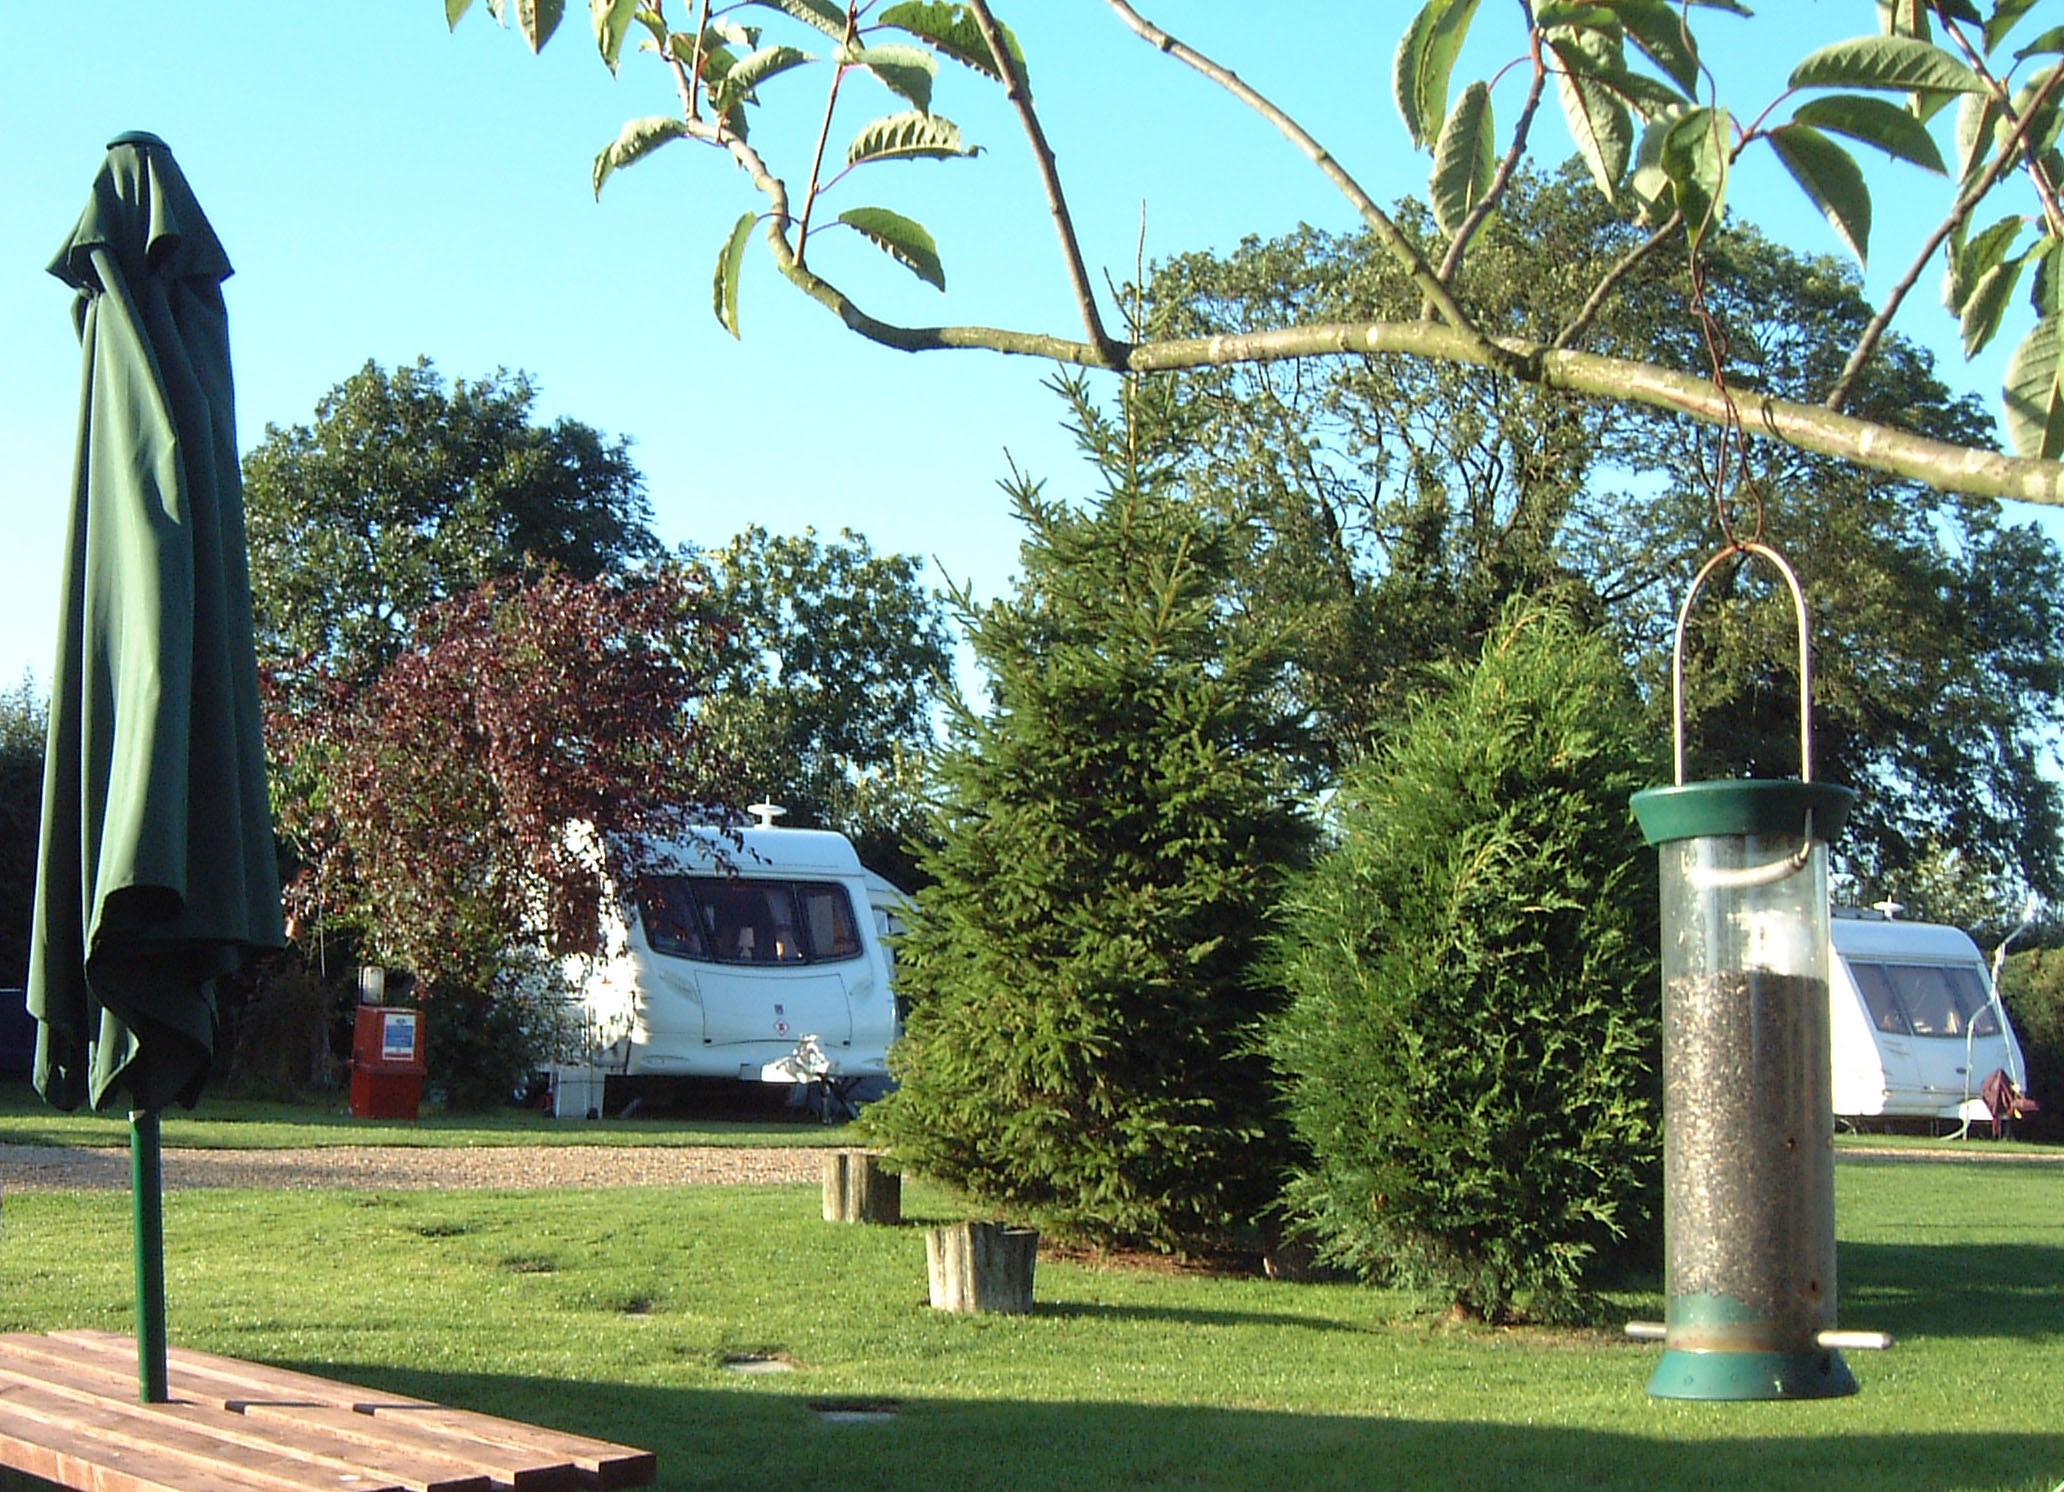 Greendale Farm Caravan Site